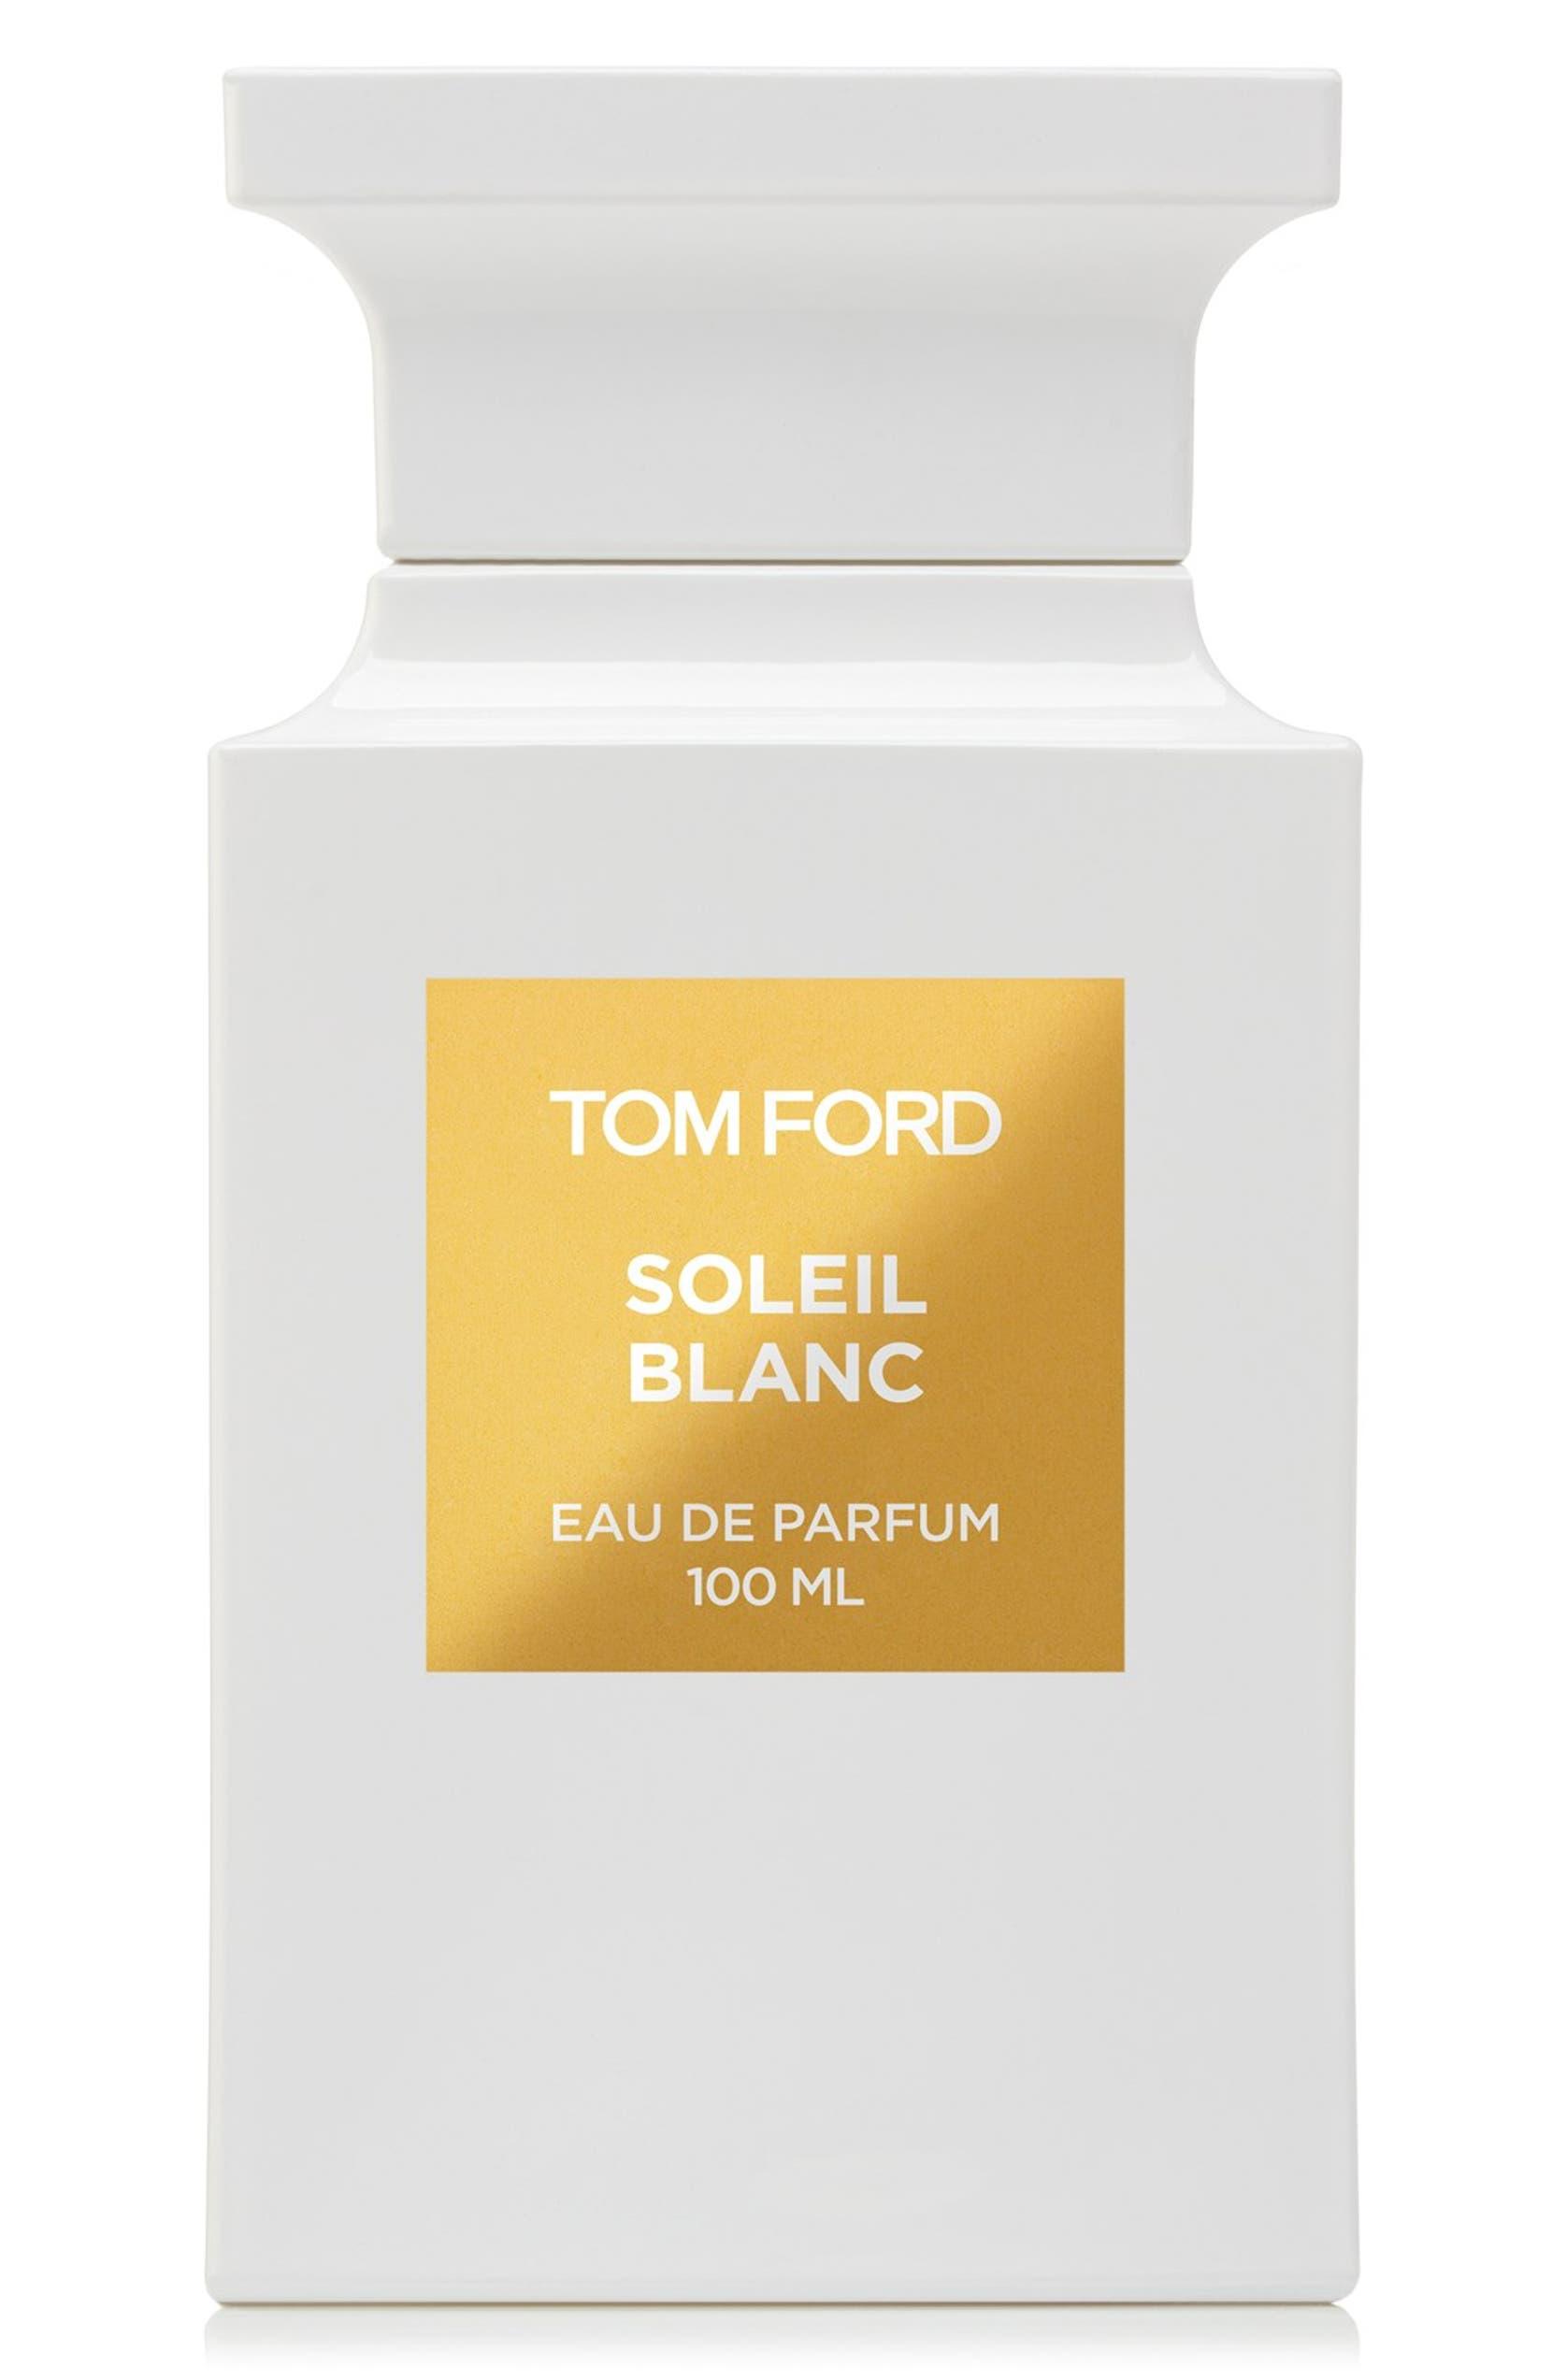 Tom Ford Private Blend Soleil Blanc Eau de Parfum   Nordstrom e9ff69c52776